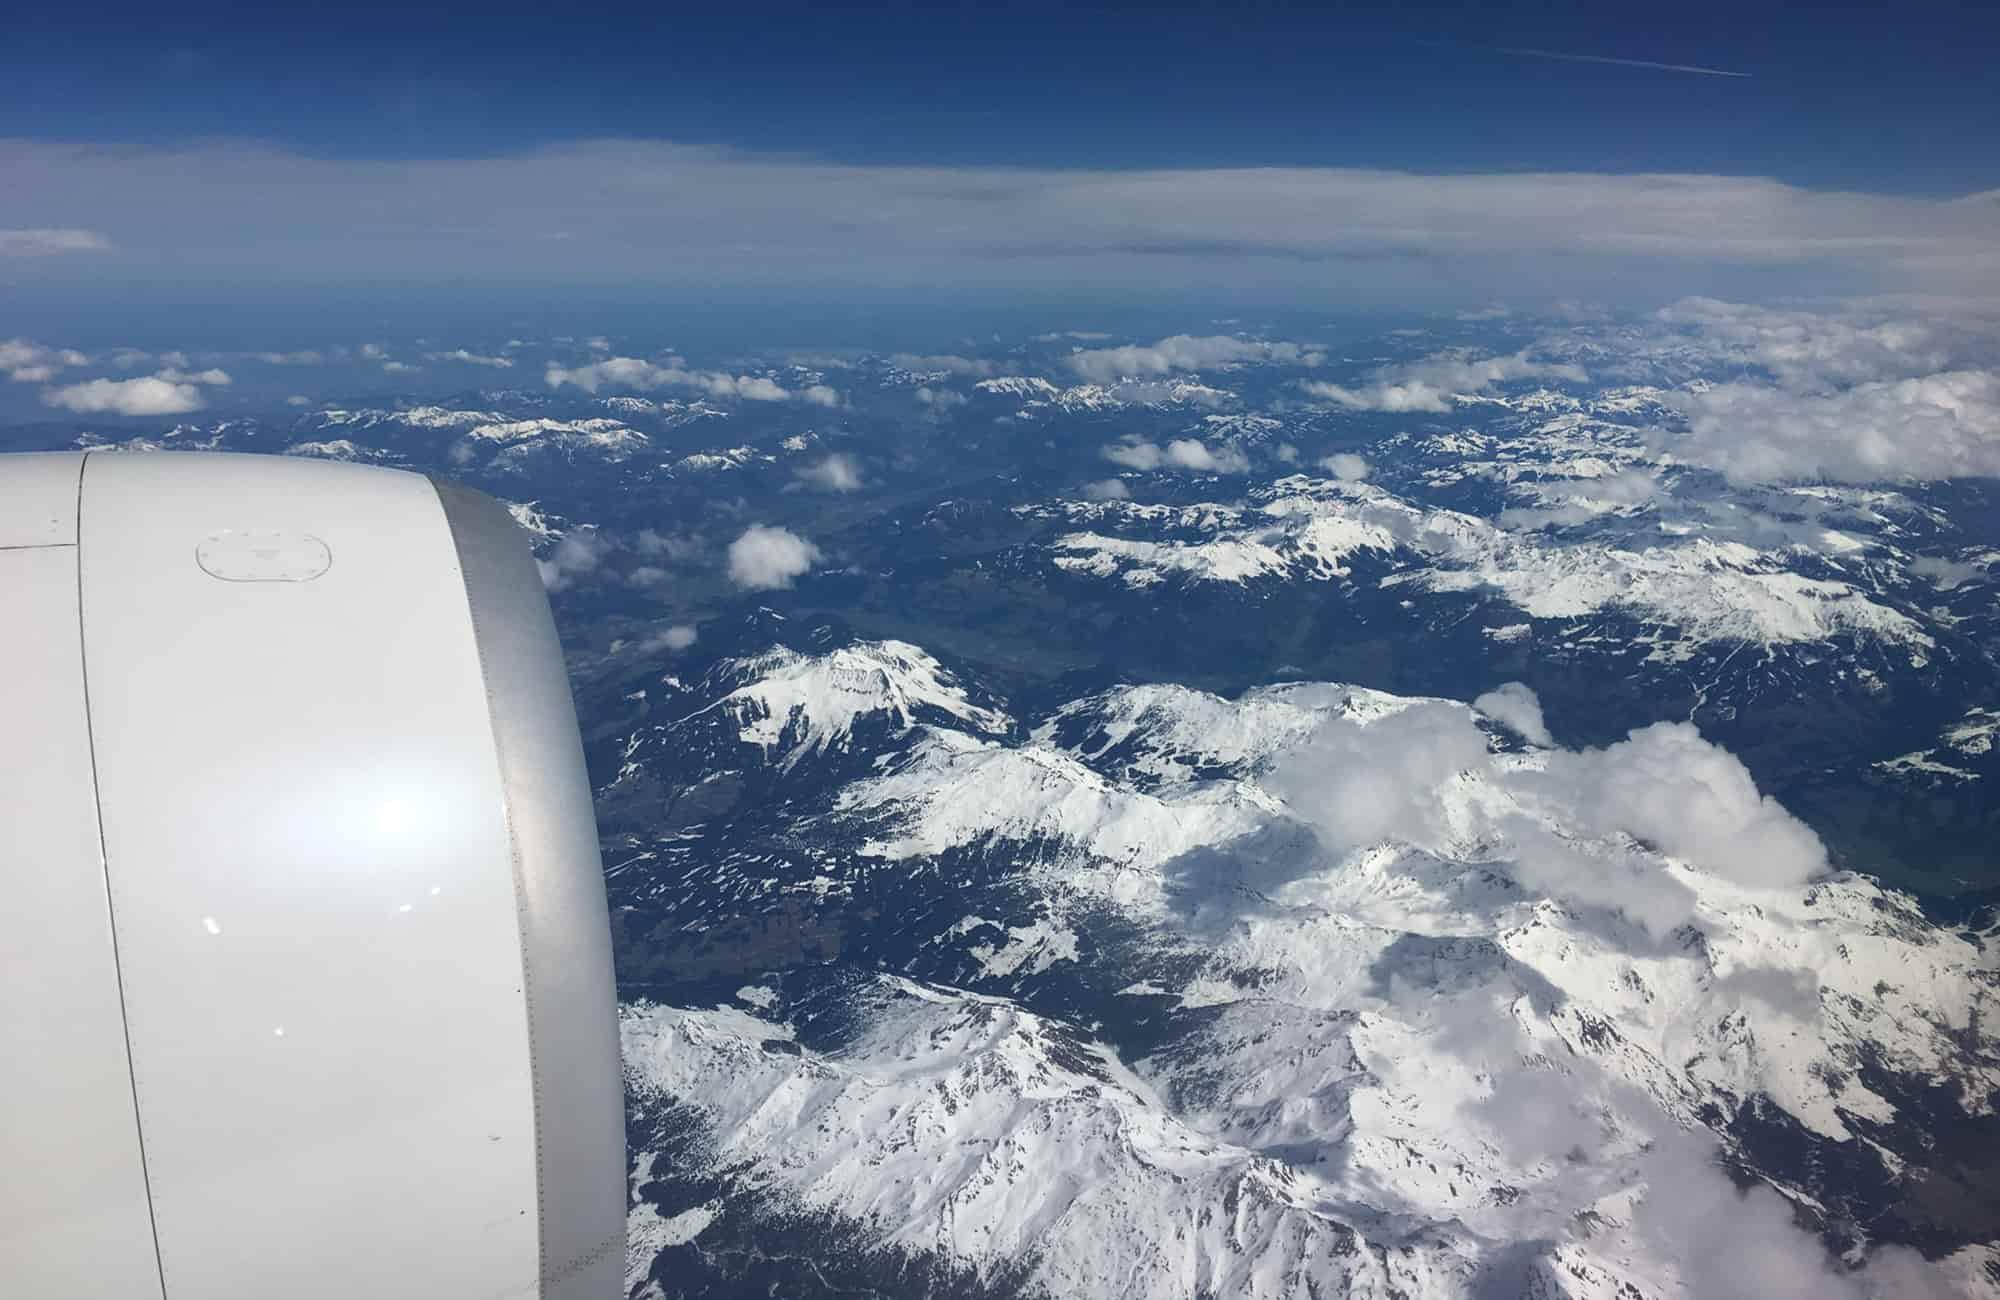 Voyage à Taiwan - Avion - Amplitudes